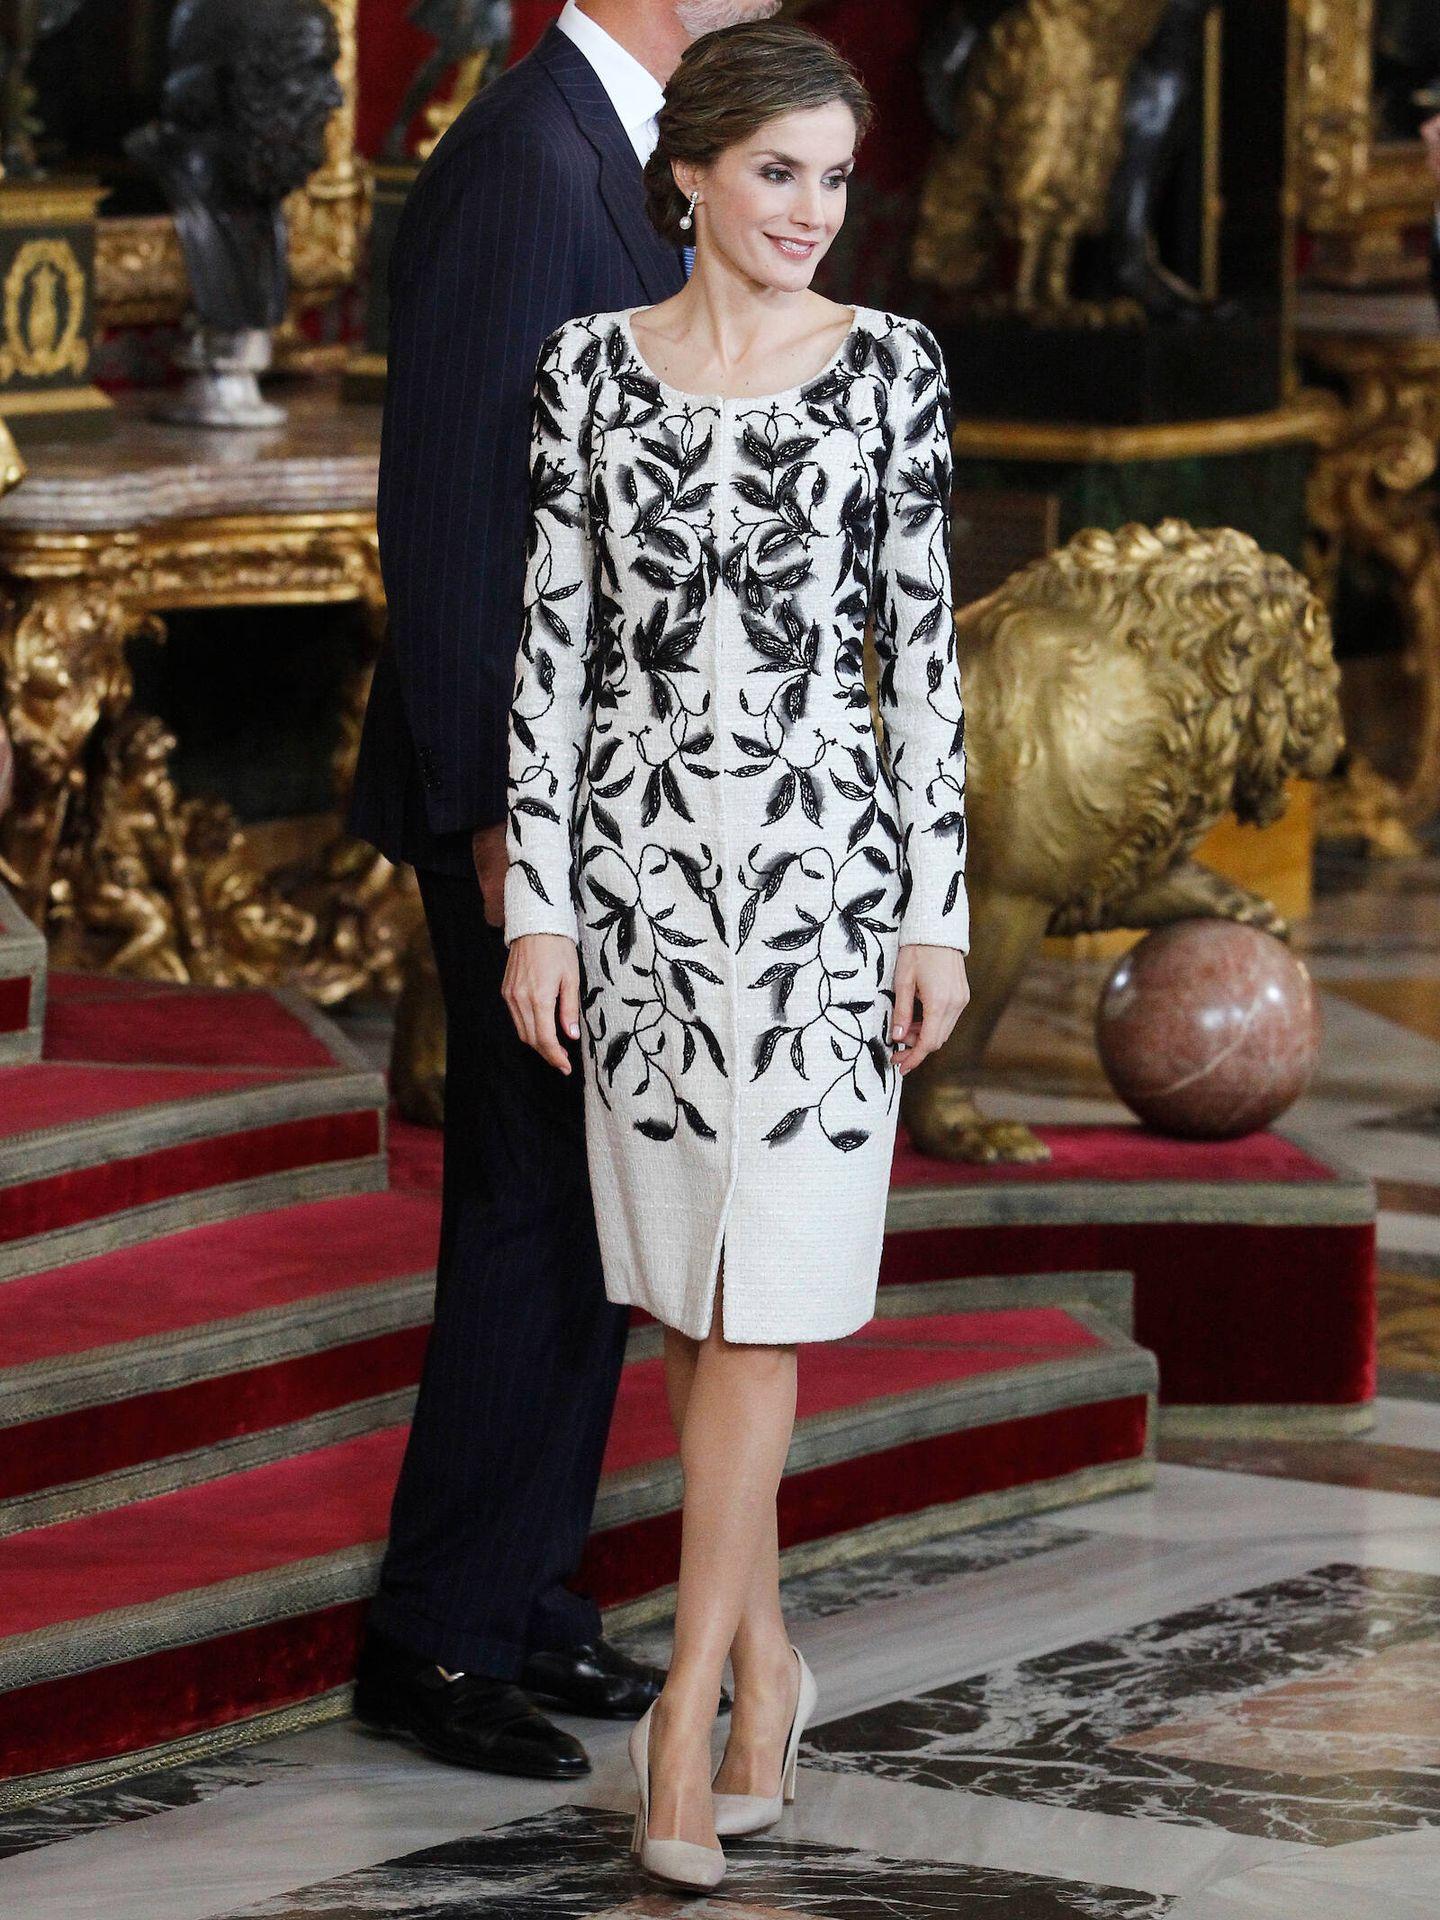 La Reina, de Varela en 2016. (LP)